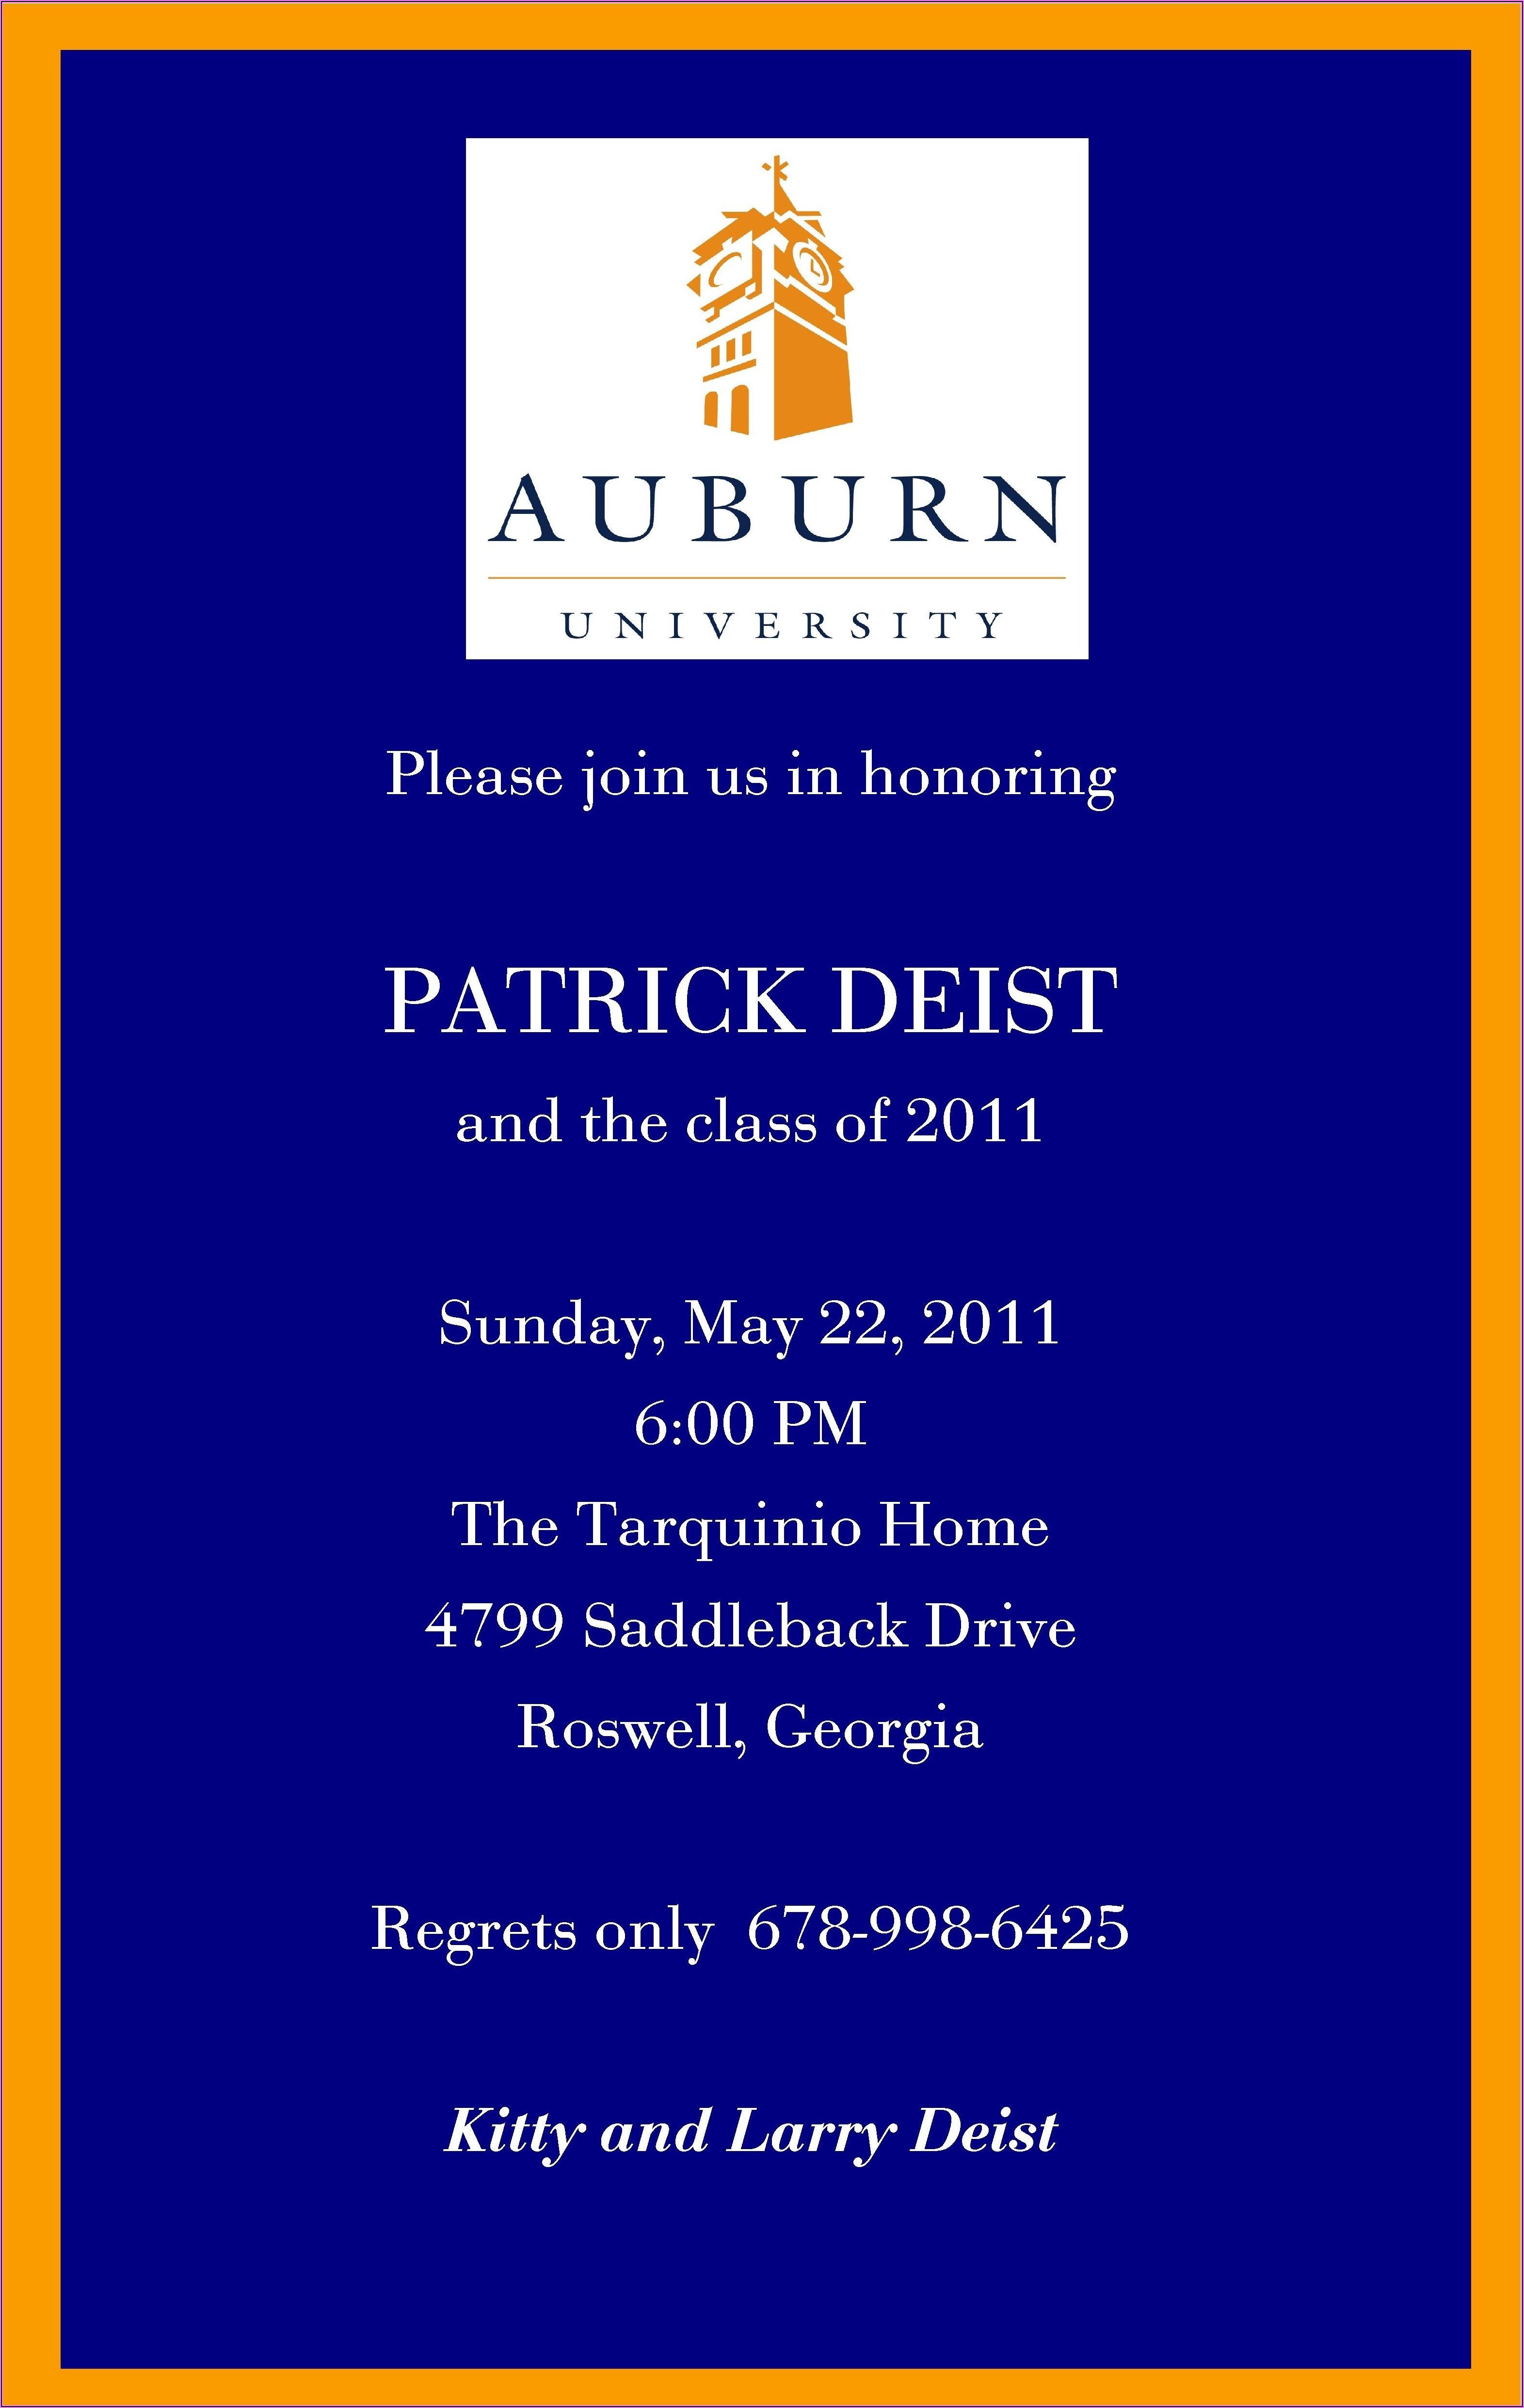 Auburn University Graduation Invitations